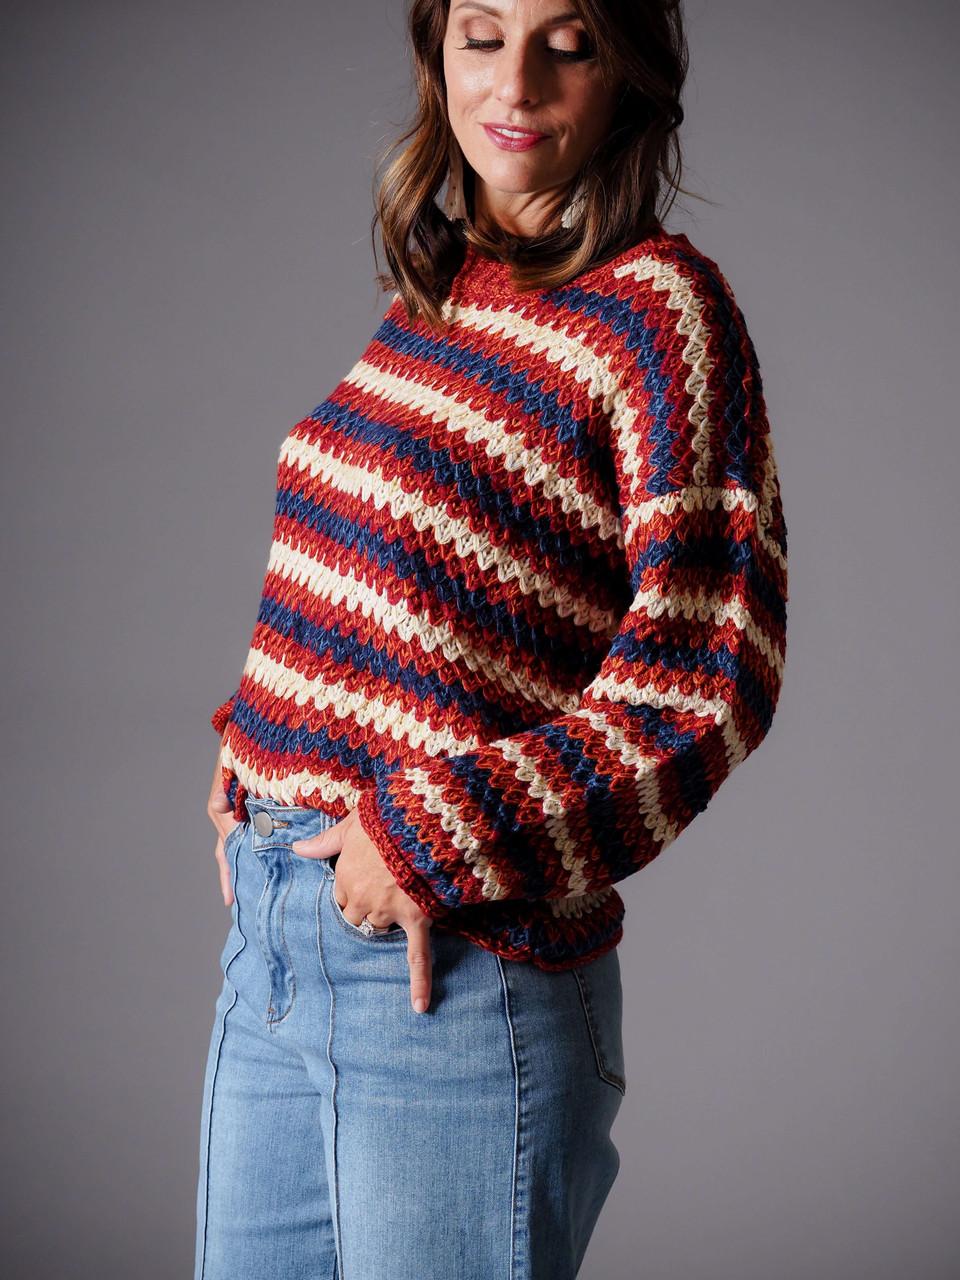 rust red burgundy blue crew neck striped sweater